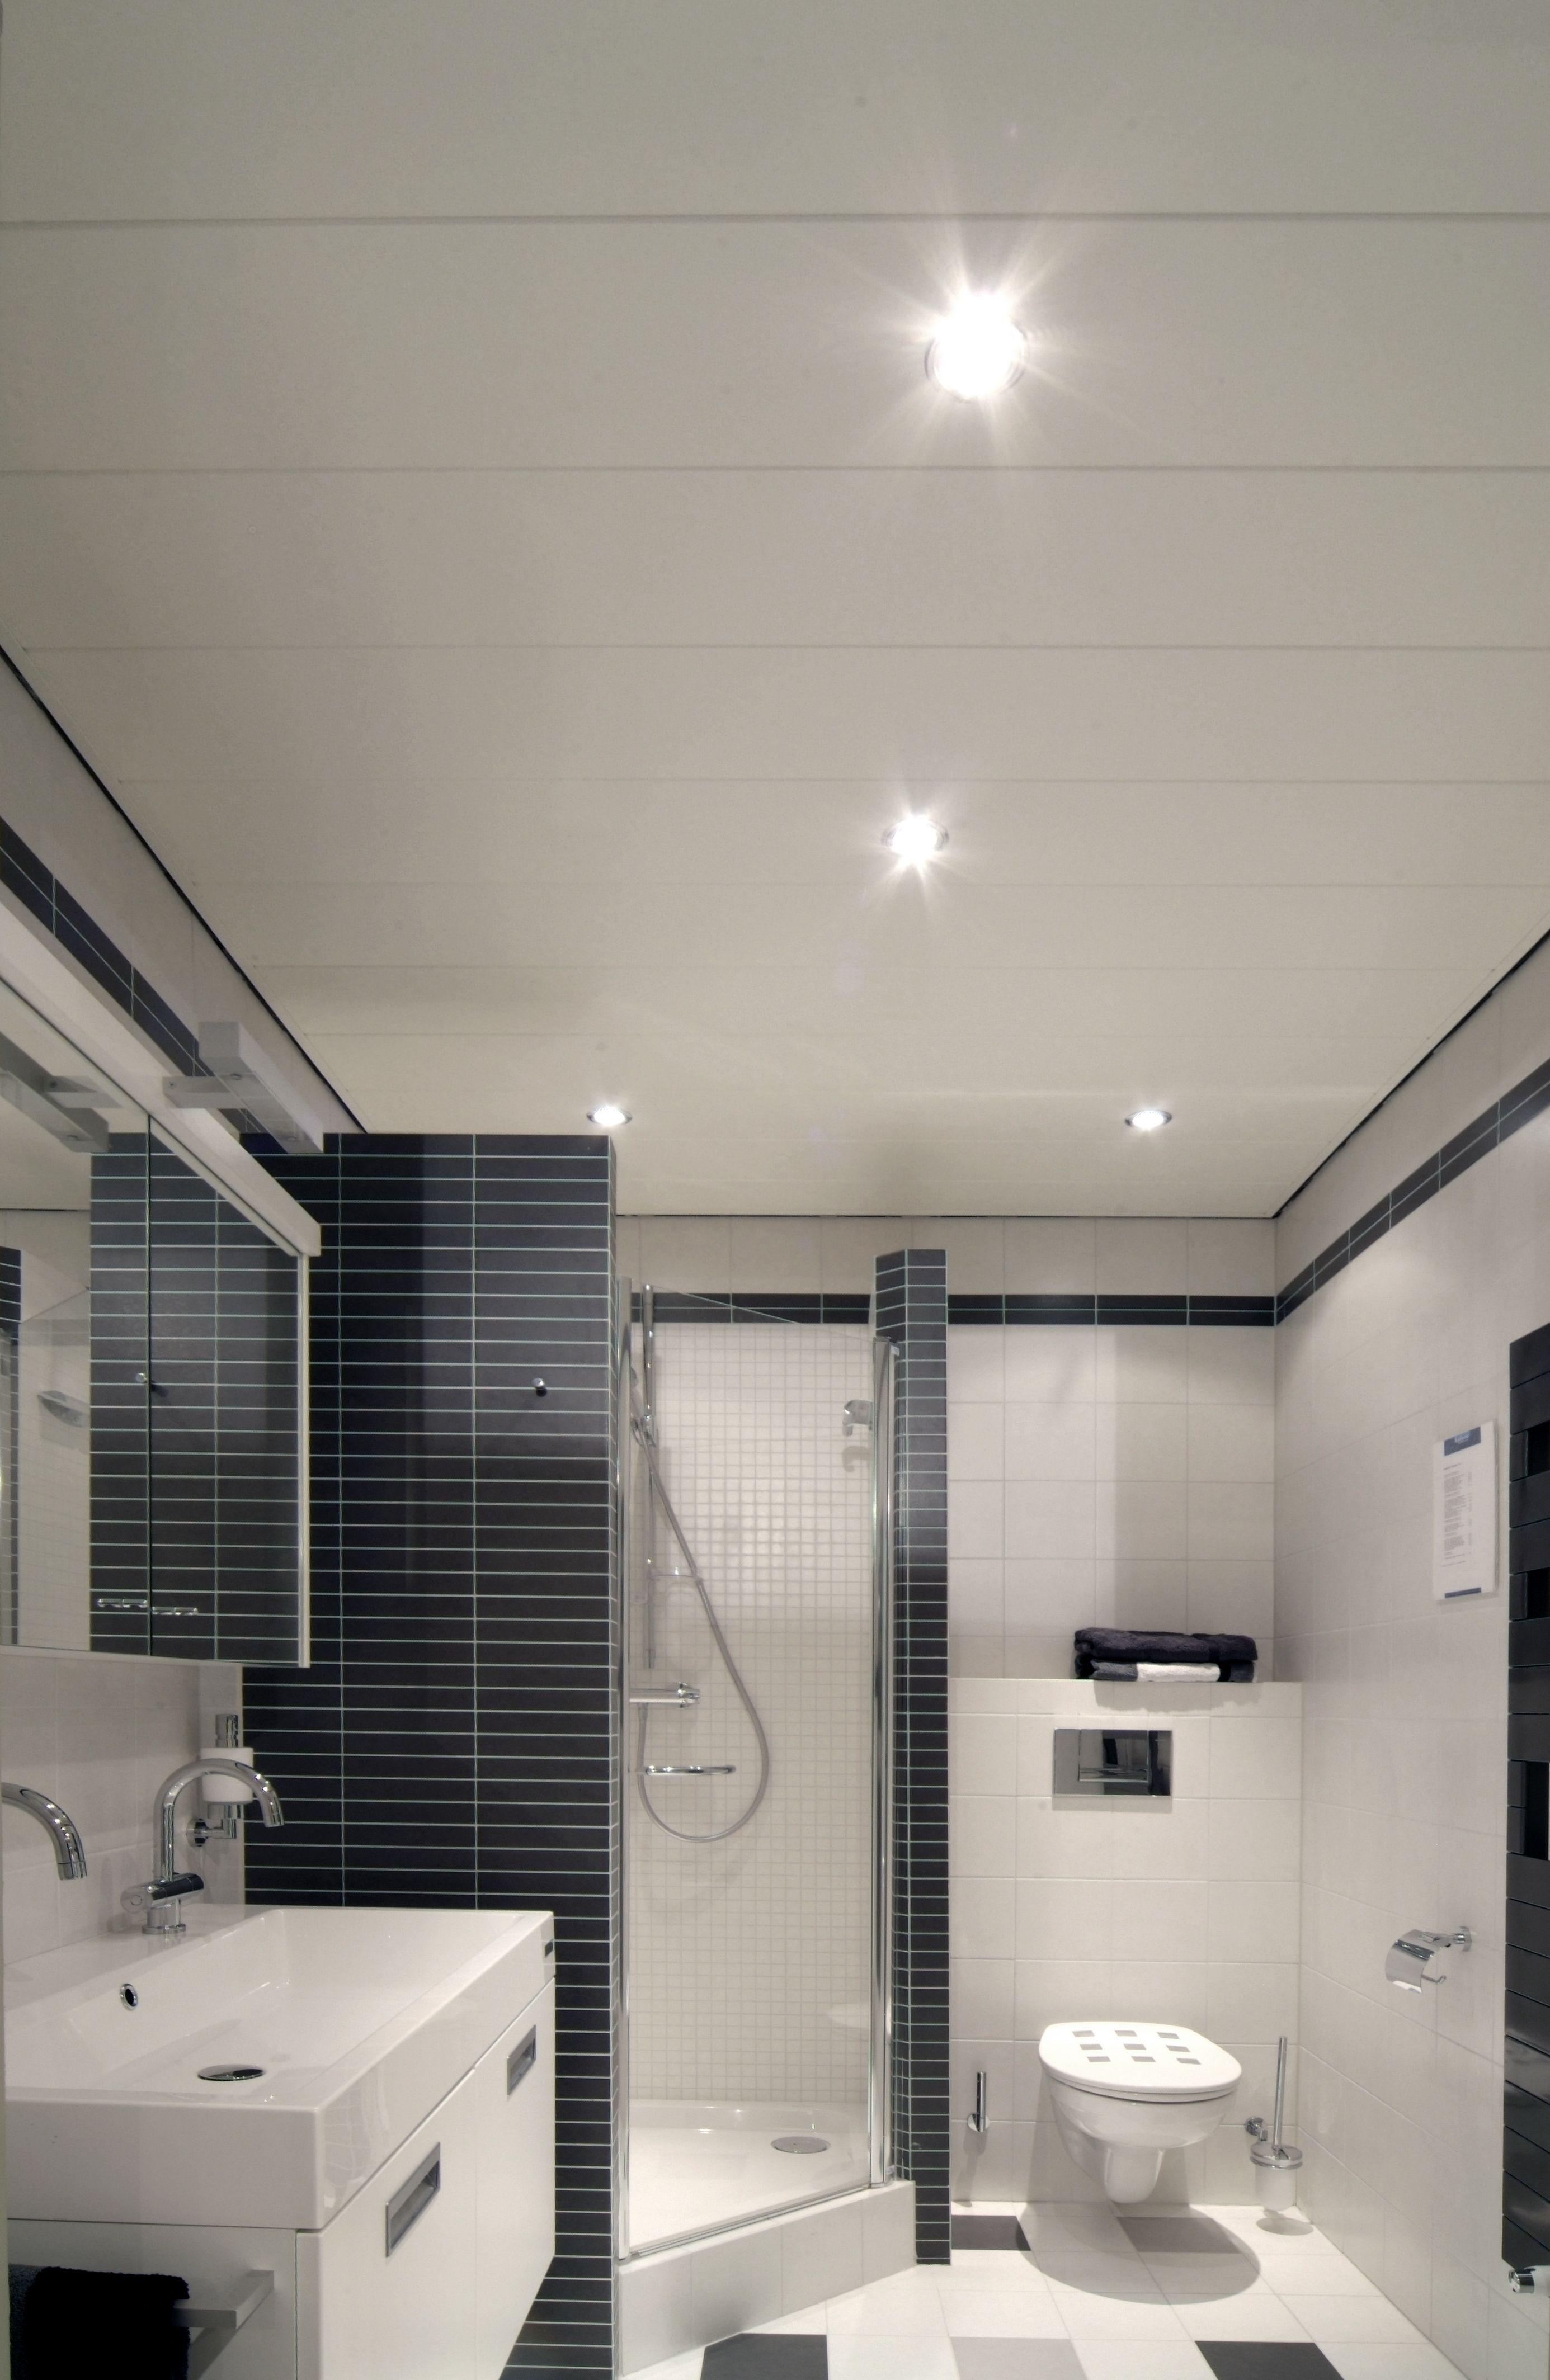 Luxalon plafond I badkamer I Aluminium plafond | Plafonds | Pinterest